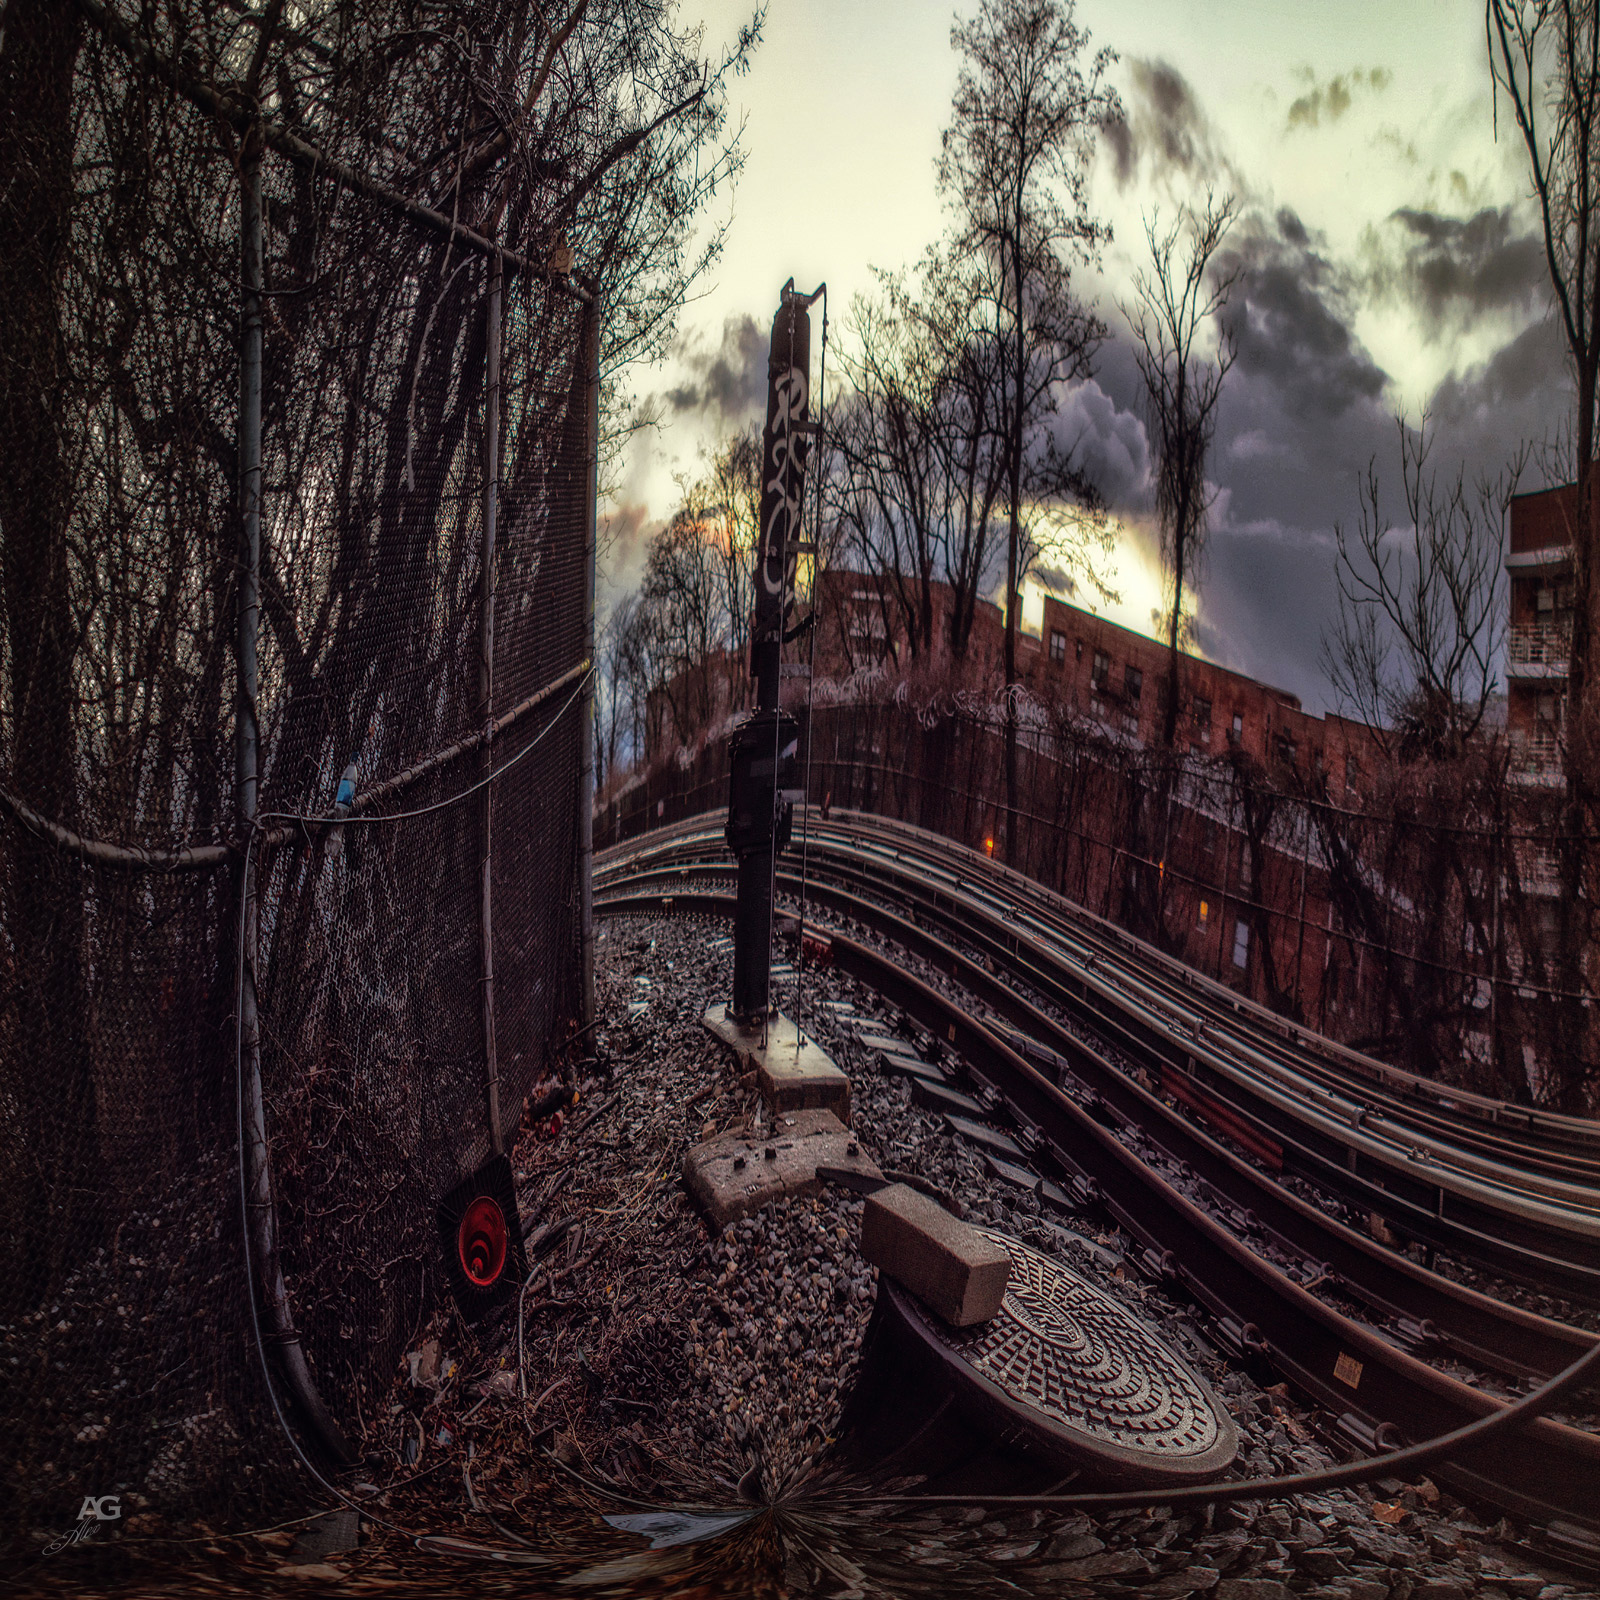 TrainTracksNearSheepsheadBaySubwayStation_unfoldedWarped_1600